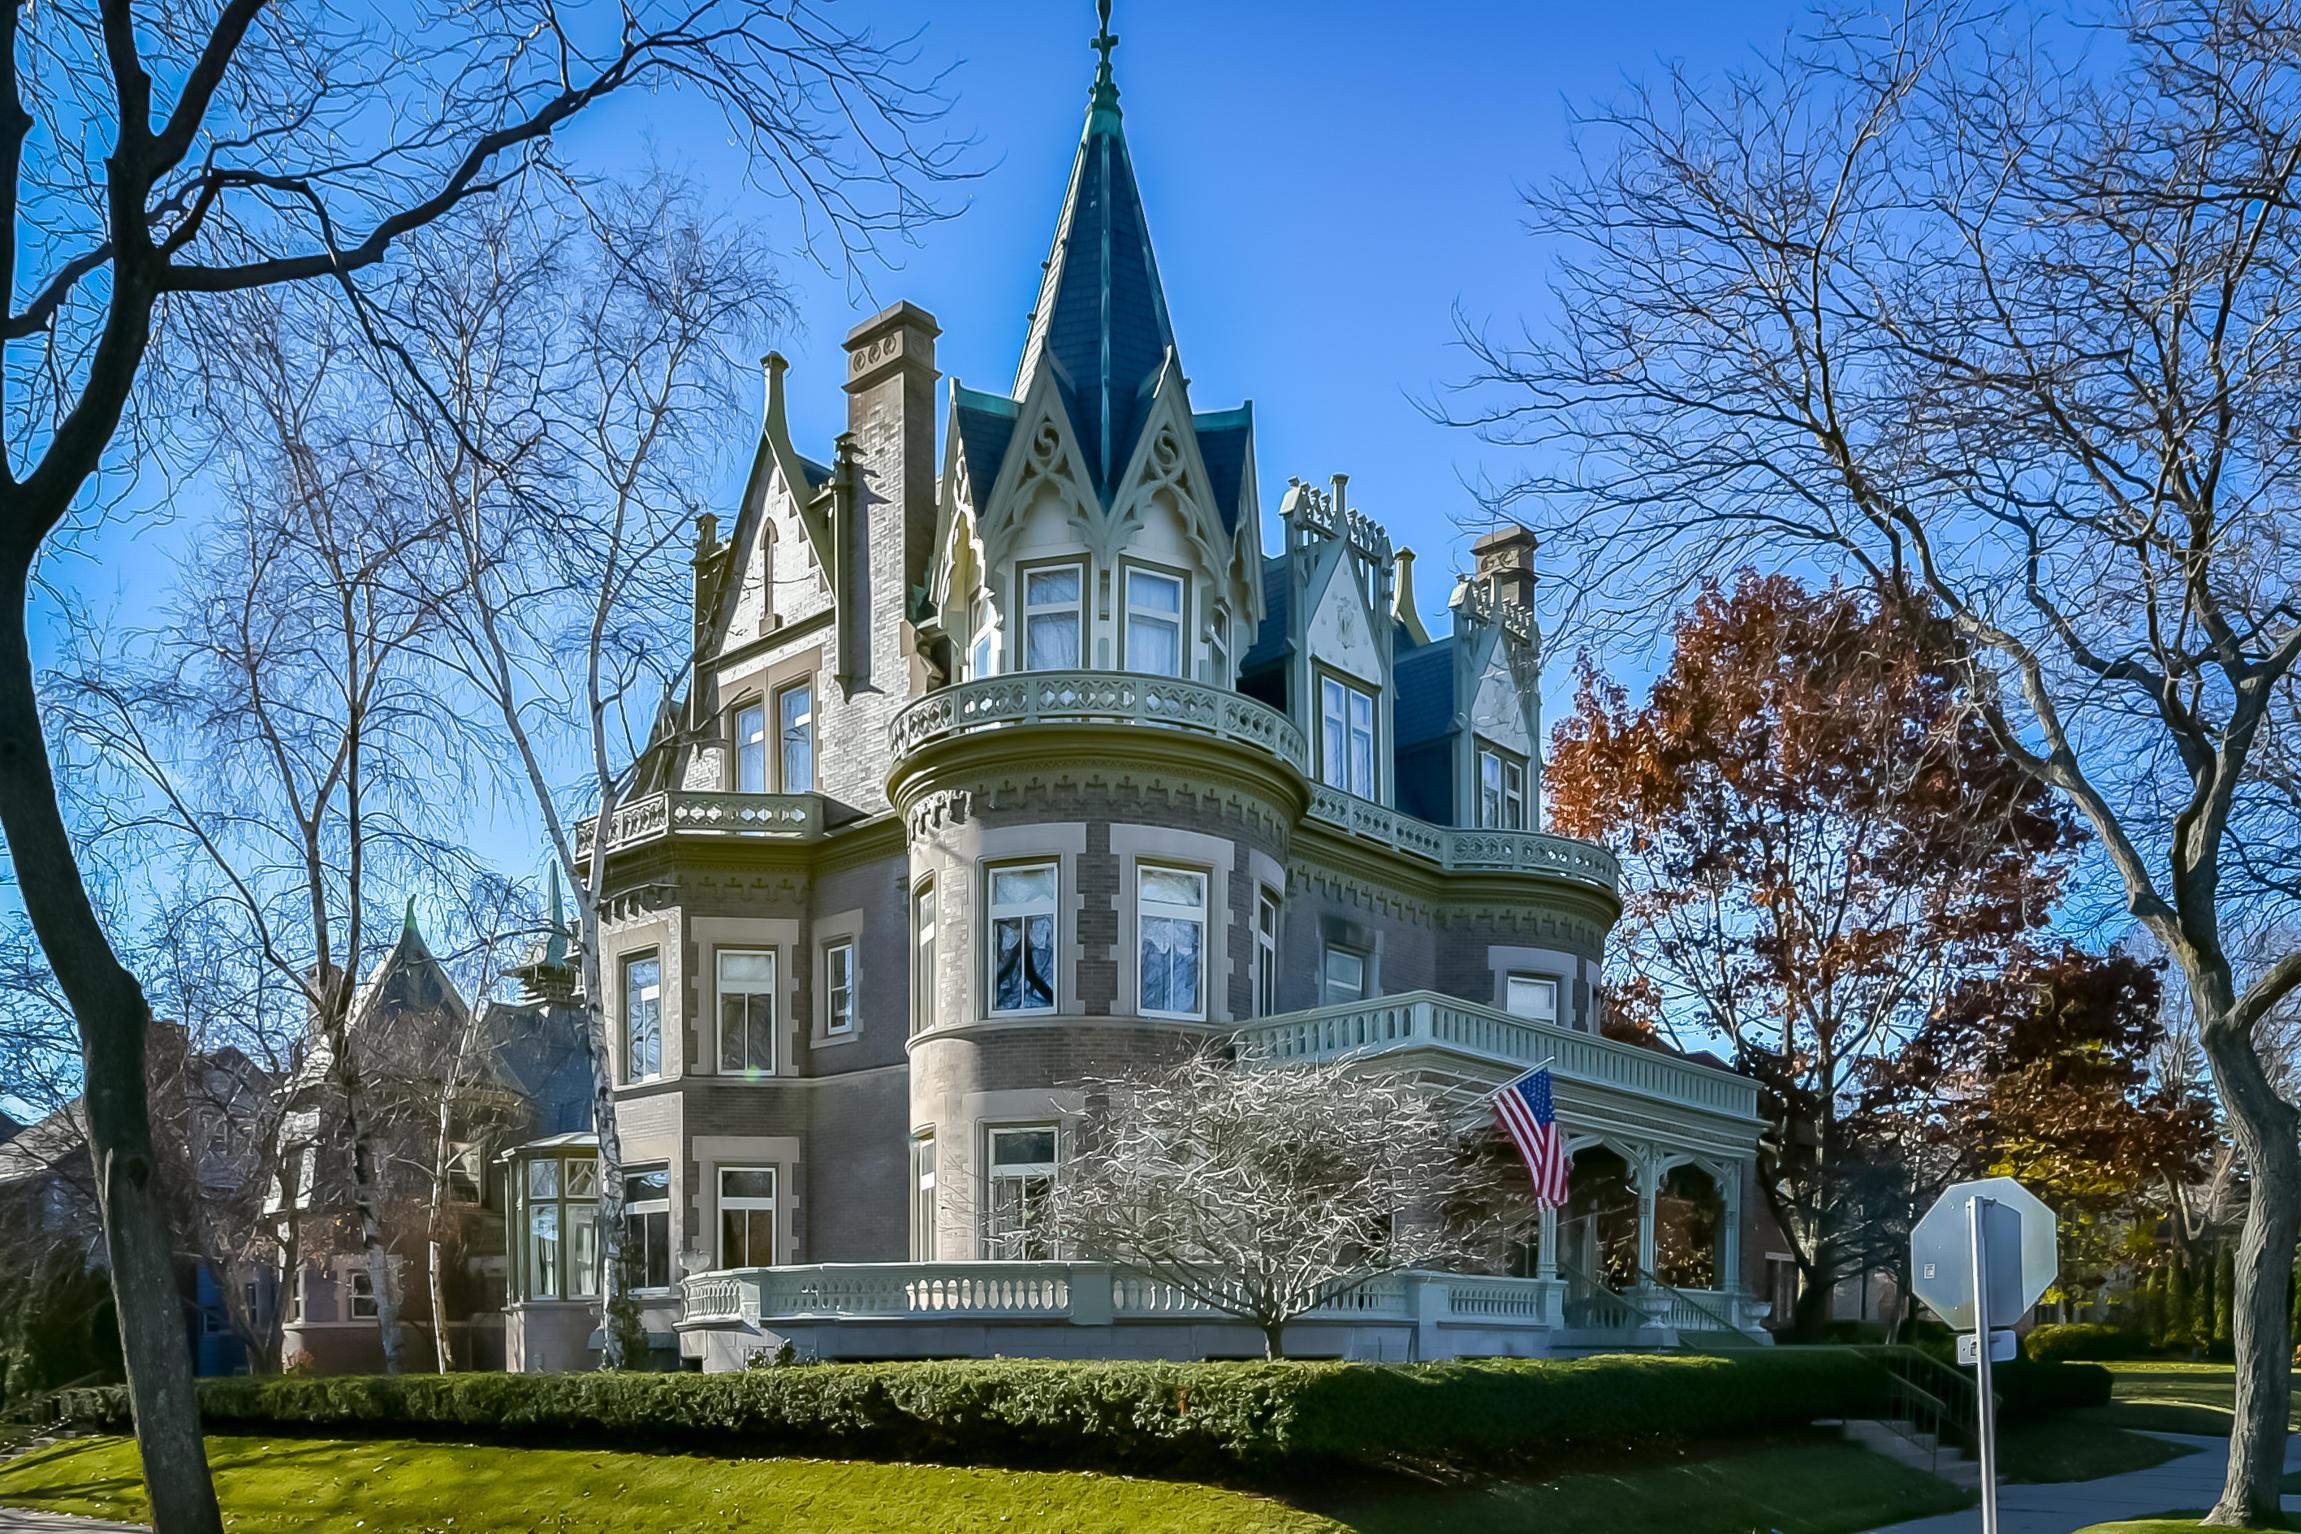 2727 Newberry Blvd, Milwaukee, Wisconsin 53211, 7 Bedrooms Bedrooms, 17 Rooms Rooms,3 BathroomsBathrooms,Single-Family,For Sale,Newberry Blvd,1626045